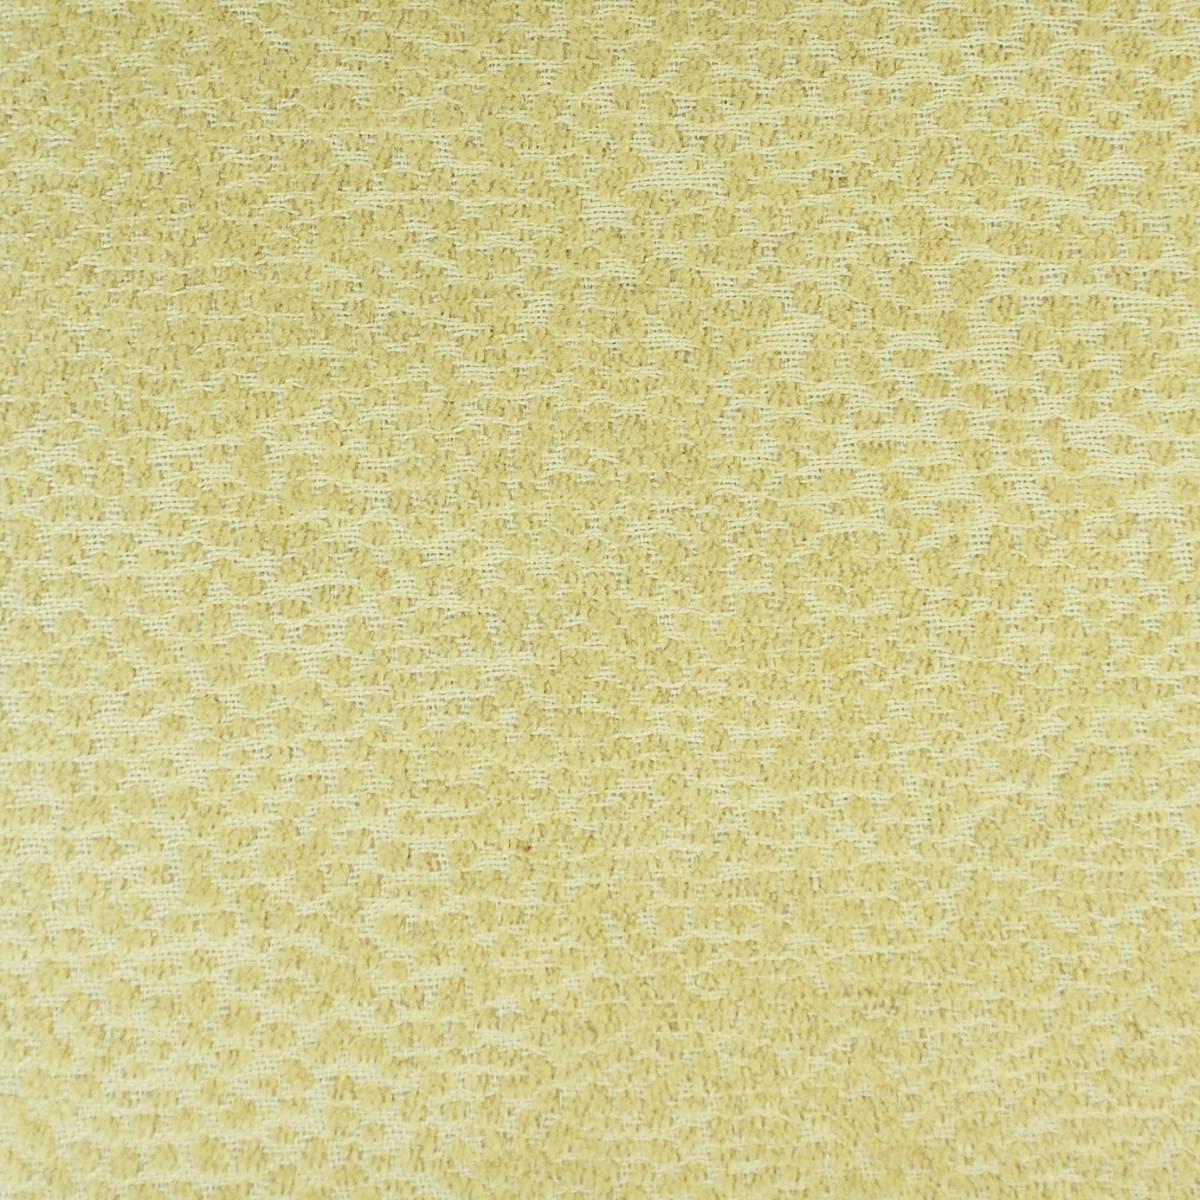 Curtains In Pippa Fabric 004 Pippa004 Blendworth Fabrics Pippa Fabrics Collection